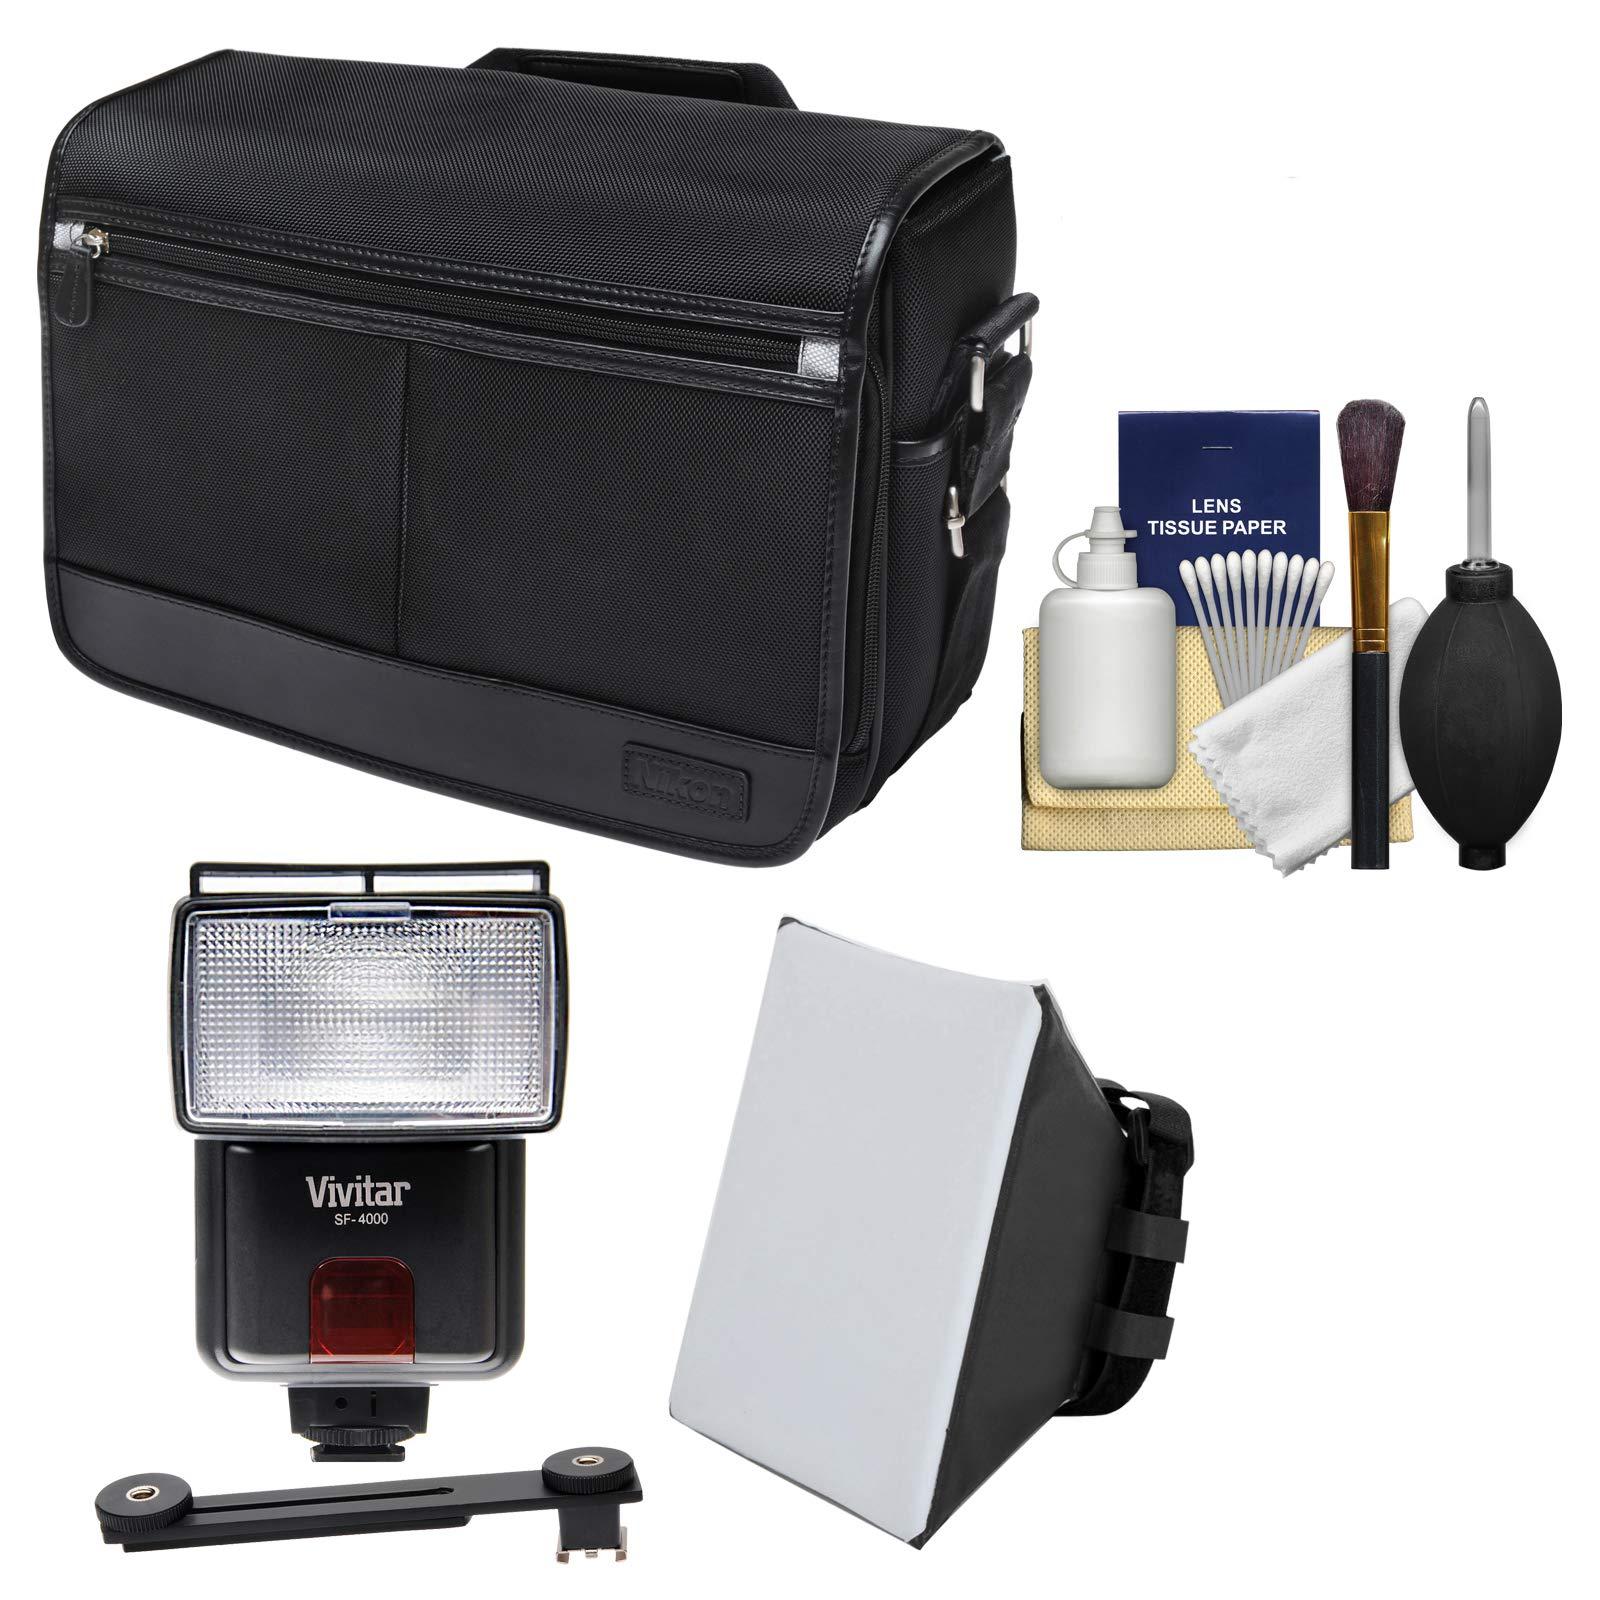 Nikon DSLR Camera/Tablet Messenger Shoulder Bag + LED Video Light & Flash + SoftBox + Diffuser Kit for D810, D750, D610, D7200, D7100, D5500, D5300, D3300, D3200